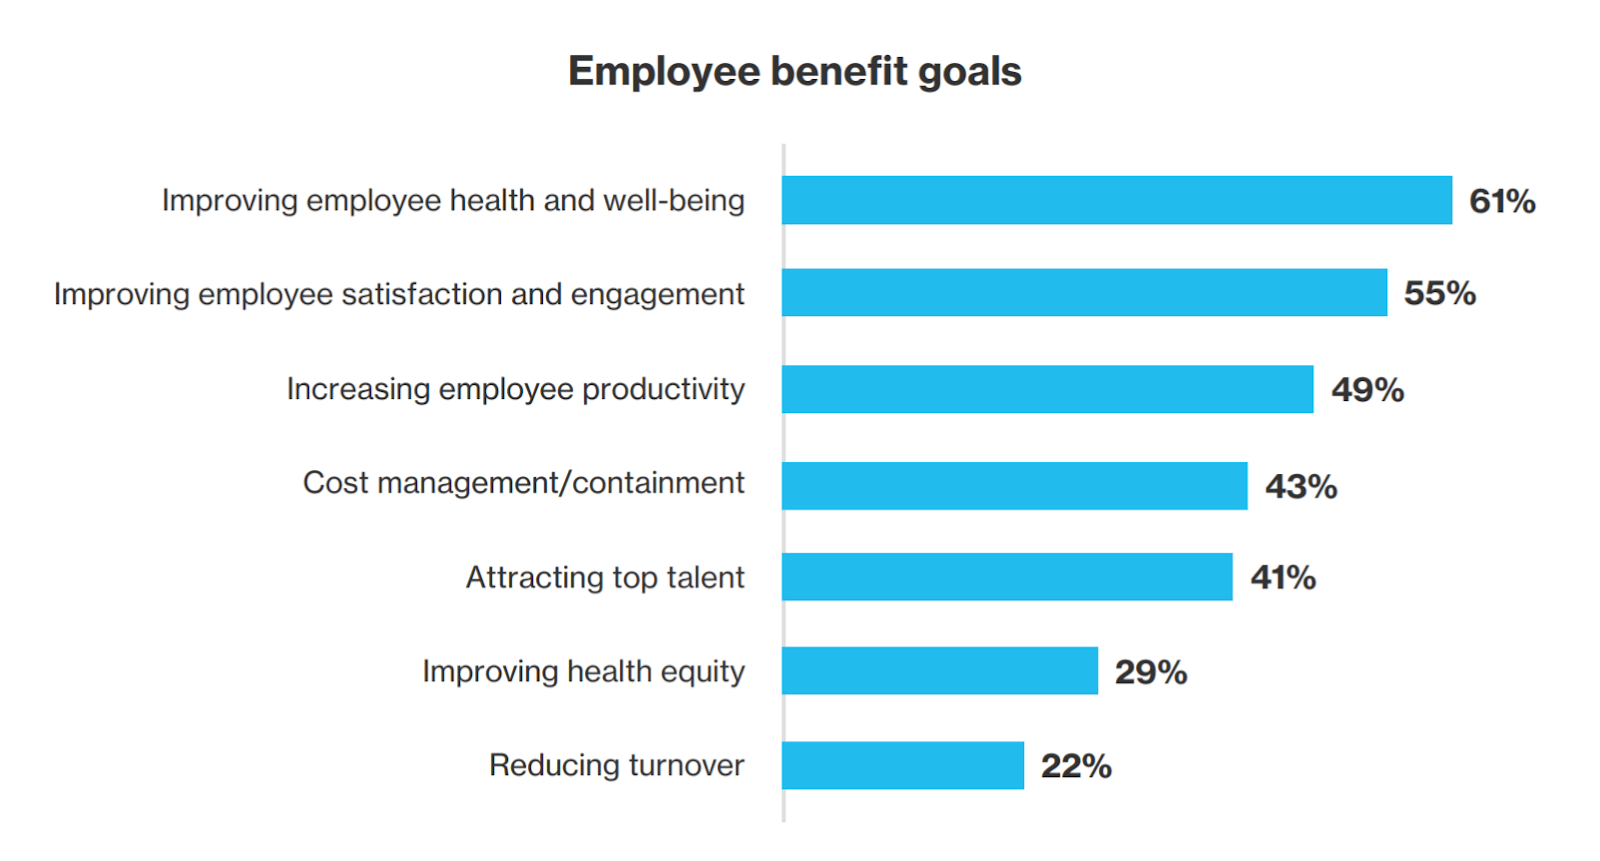 Bar chart showing employee benefit goals for organizations.